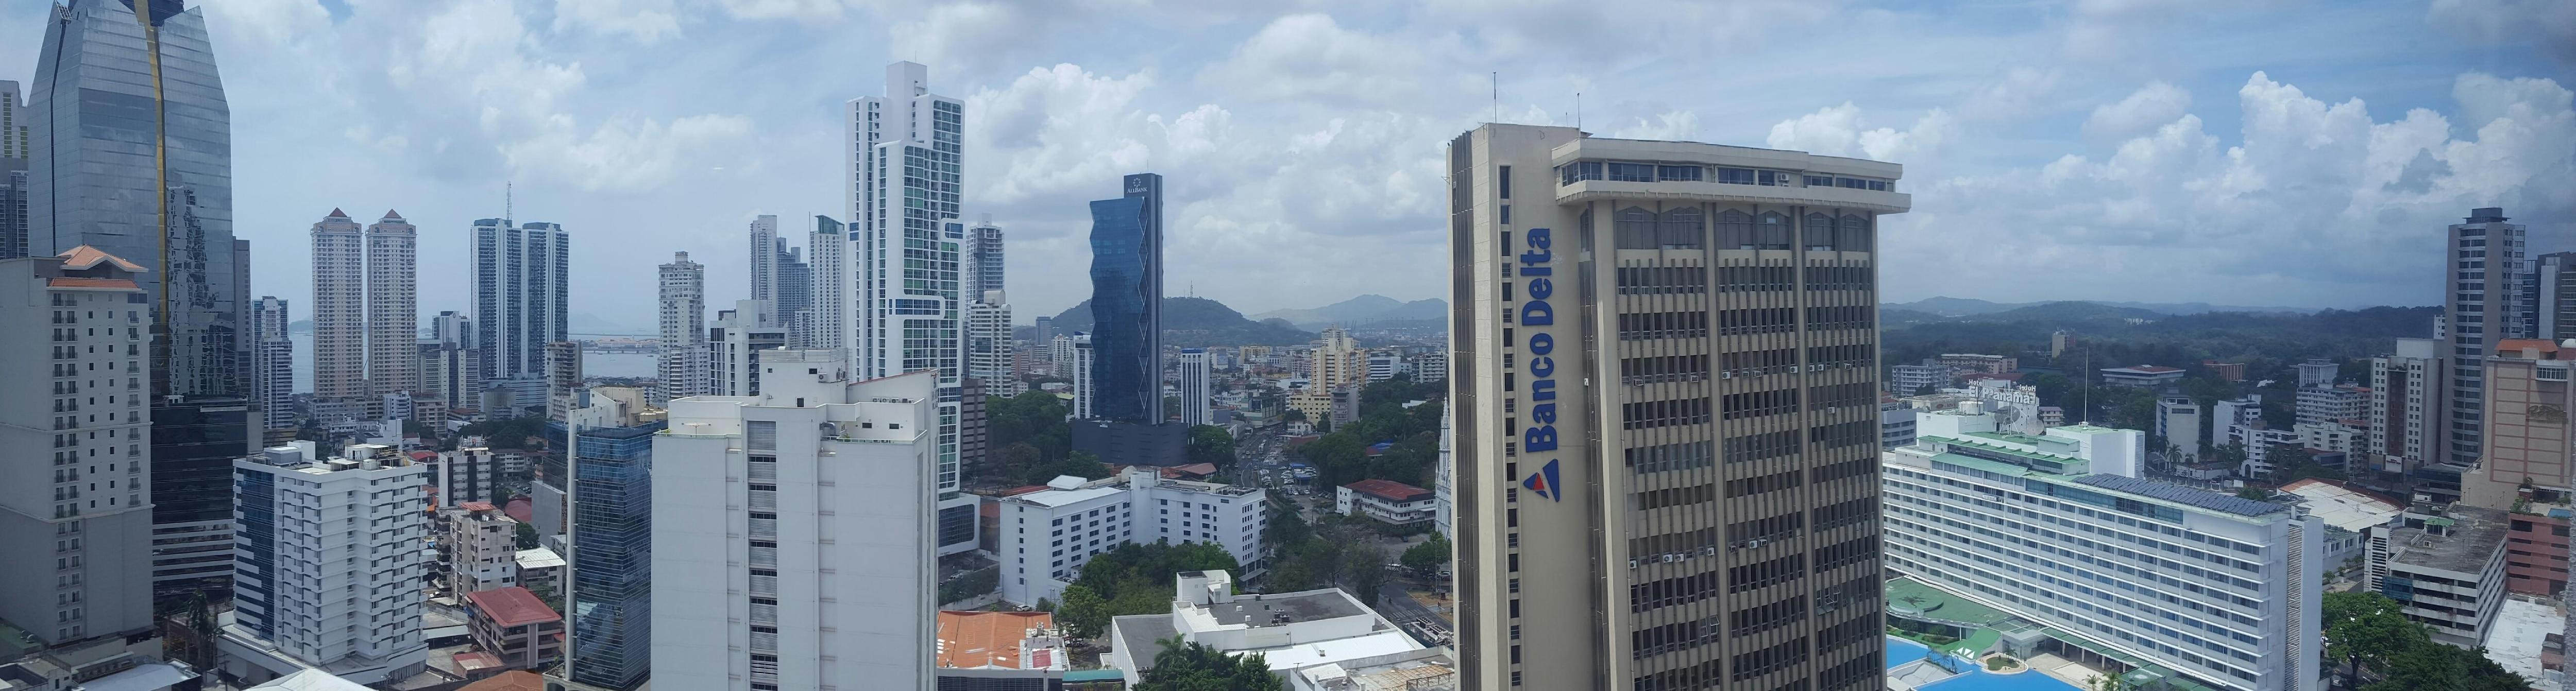 Hotel window view.